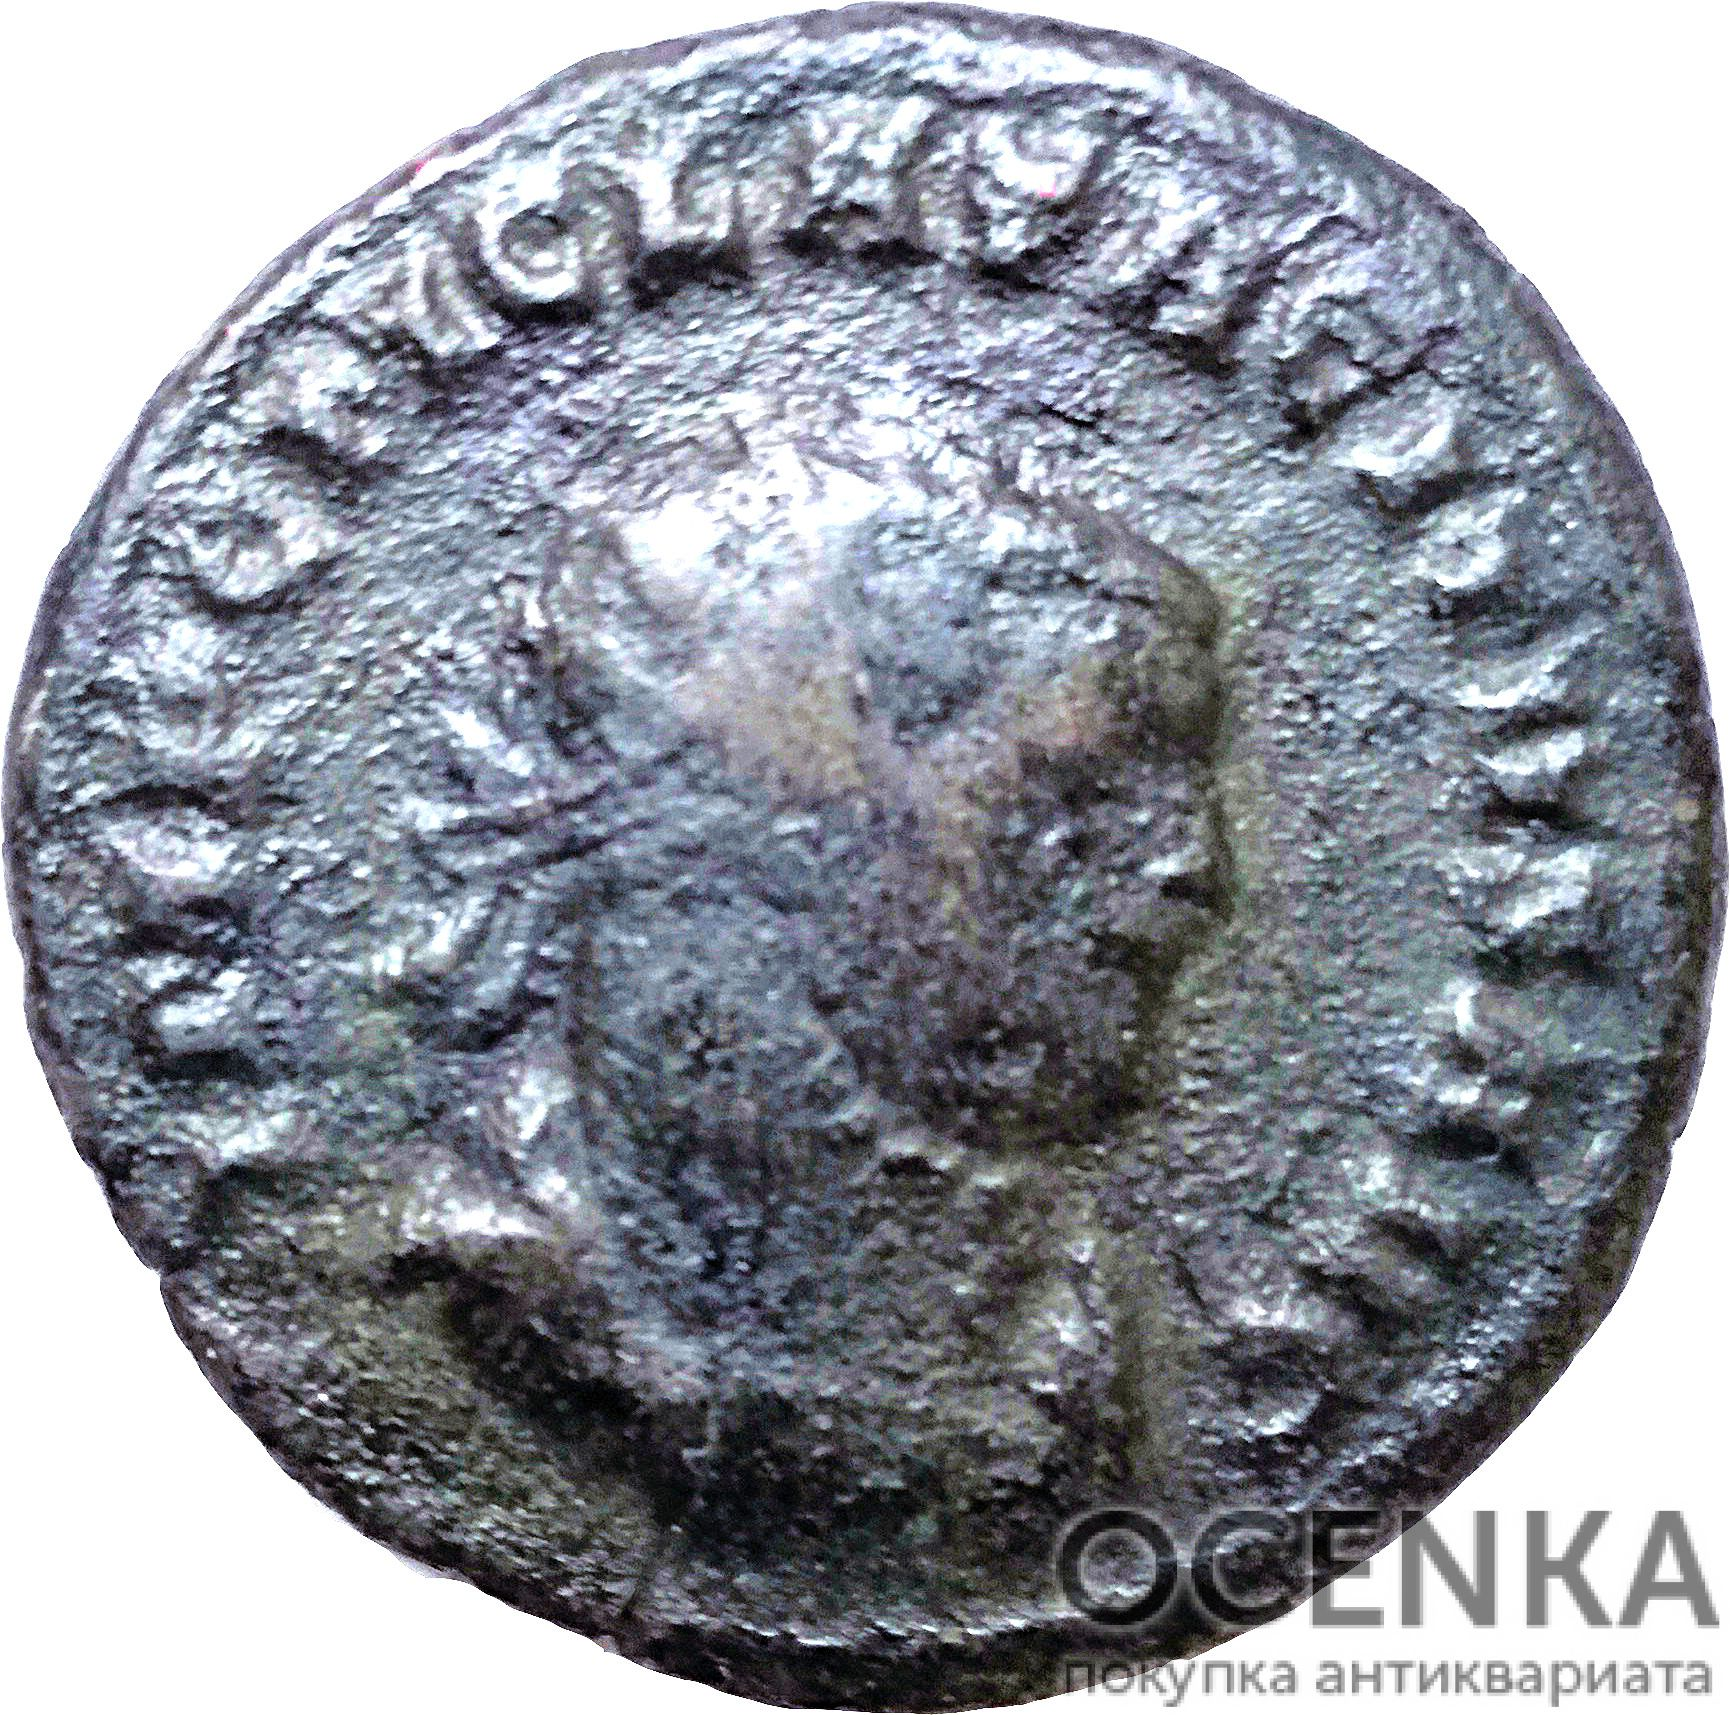 Серебряный Антониниан Цезаря Марка Клавдия Тацита Августа, 275-276 год